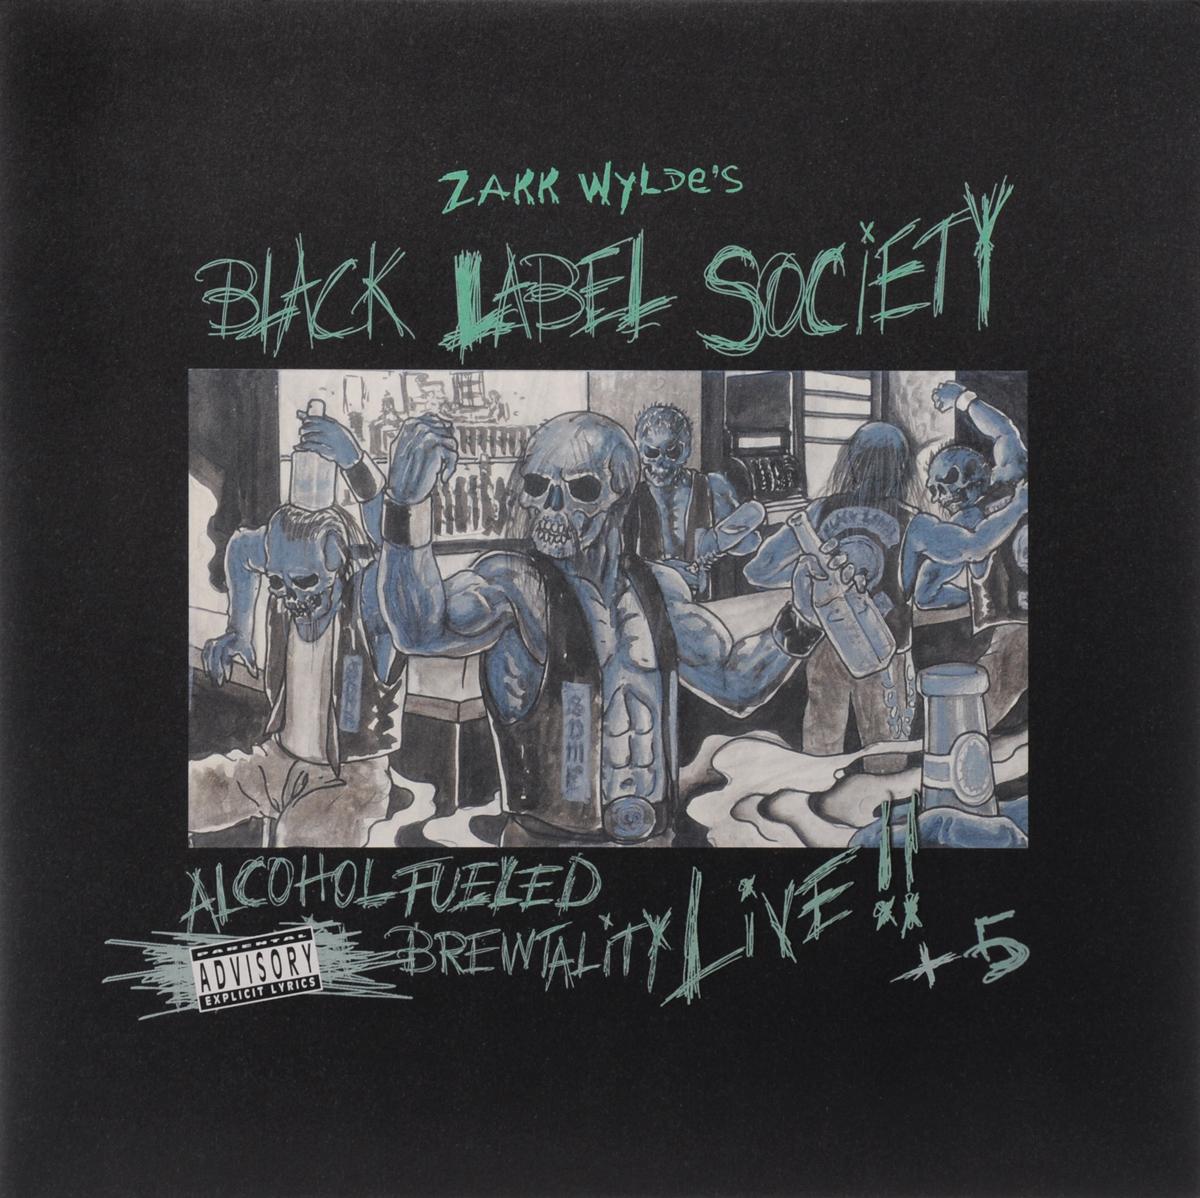 Black Label Society Black Label Society. Alcohol Fueled Brewtality Live!! +5 (2 LP)